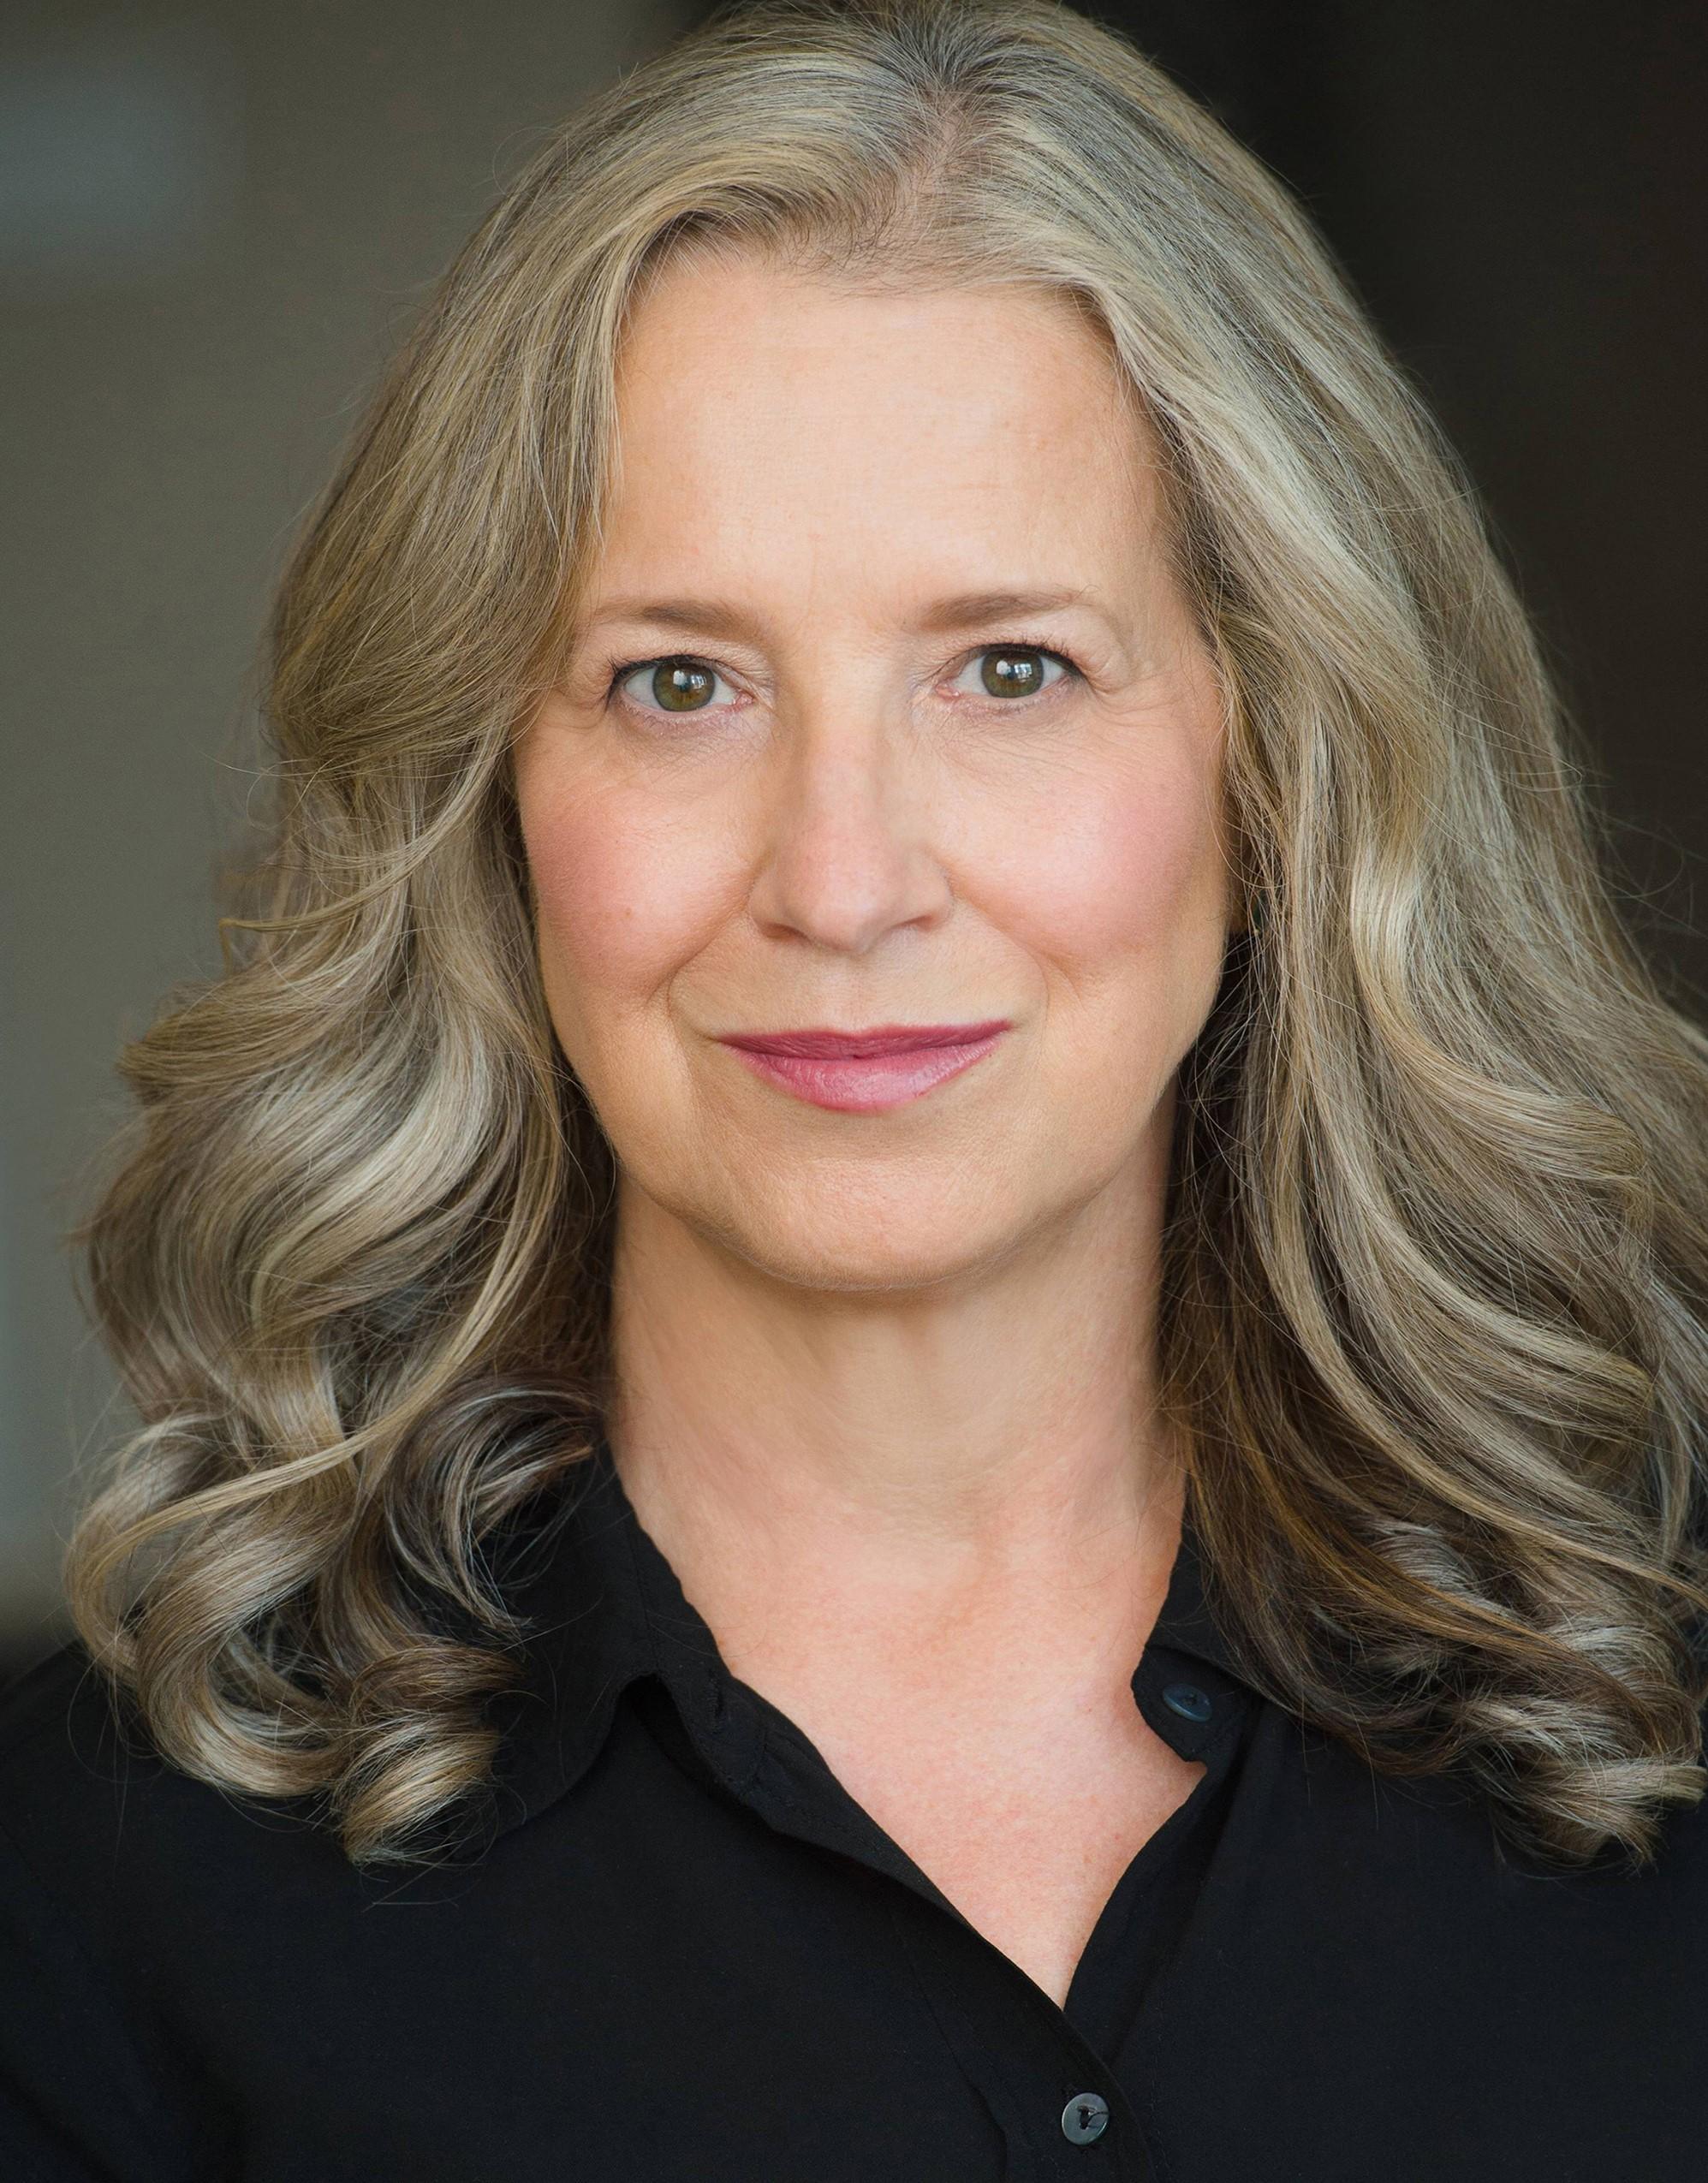 Cathy Cavender